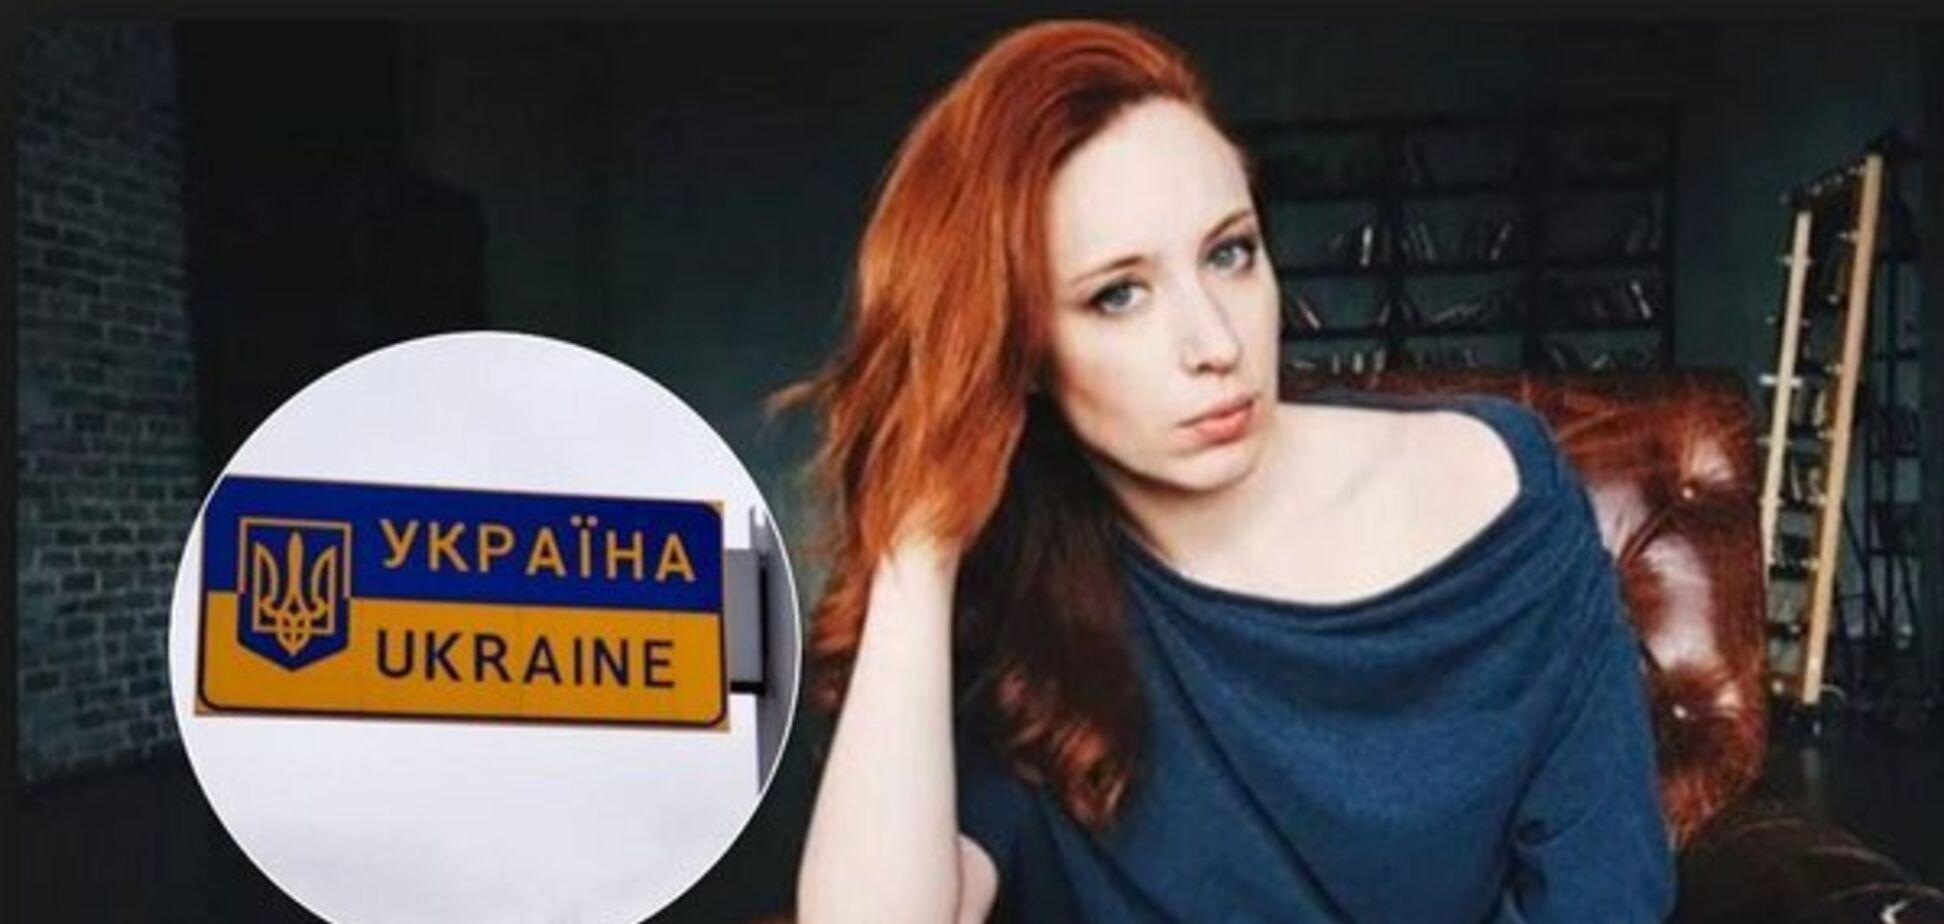 'Ради нацбезопасности': блогеру-противнице Путина запретили въезд в Украину